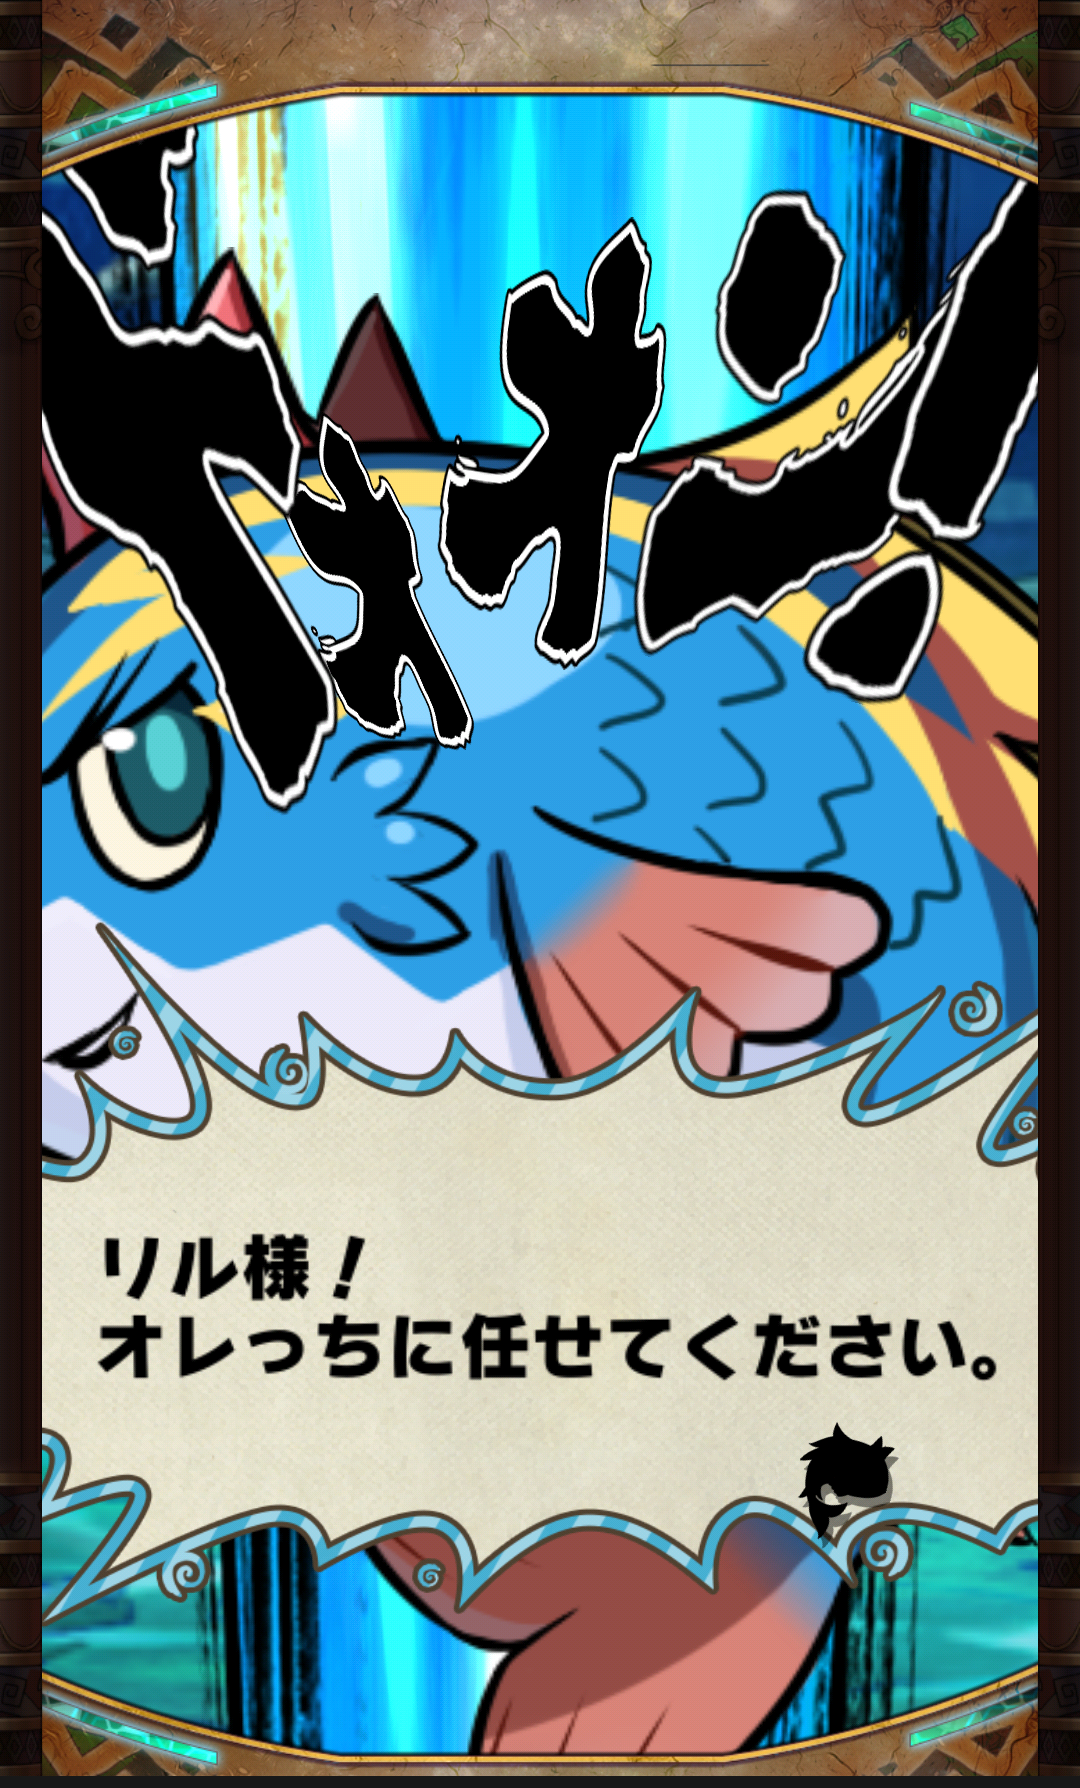 androidアプリ アニモン 人魚姫マーメの冒険攻略スクリーンショット2